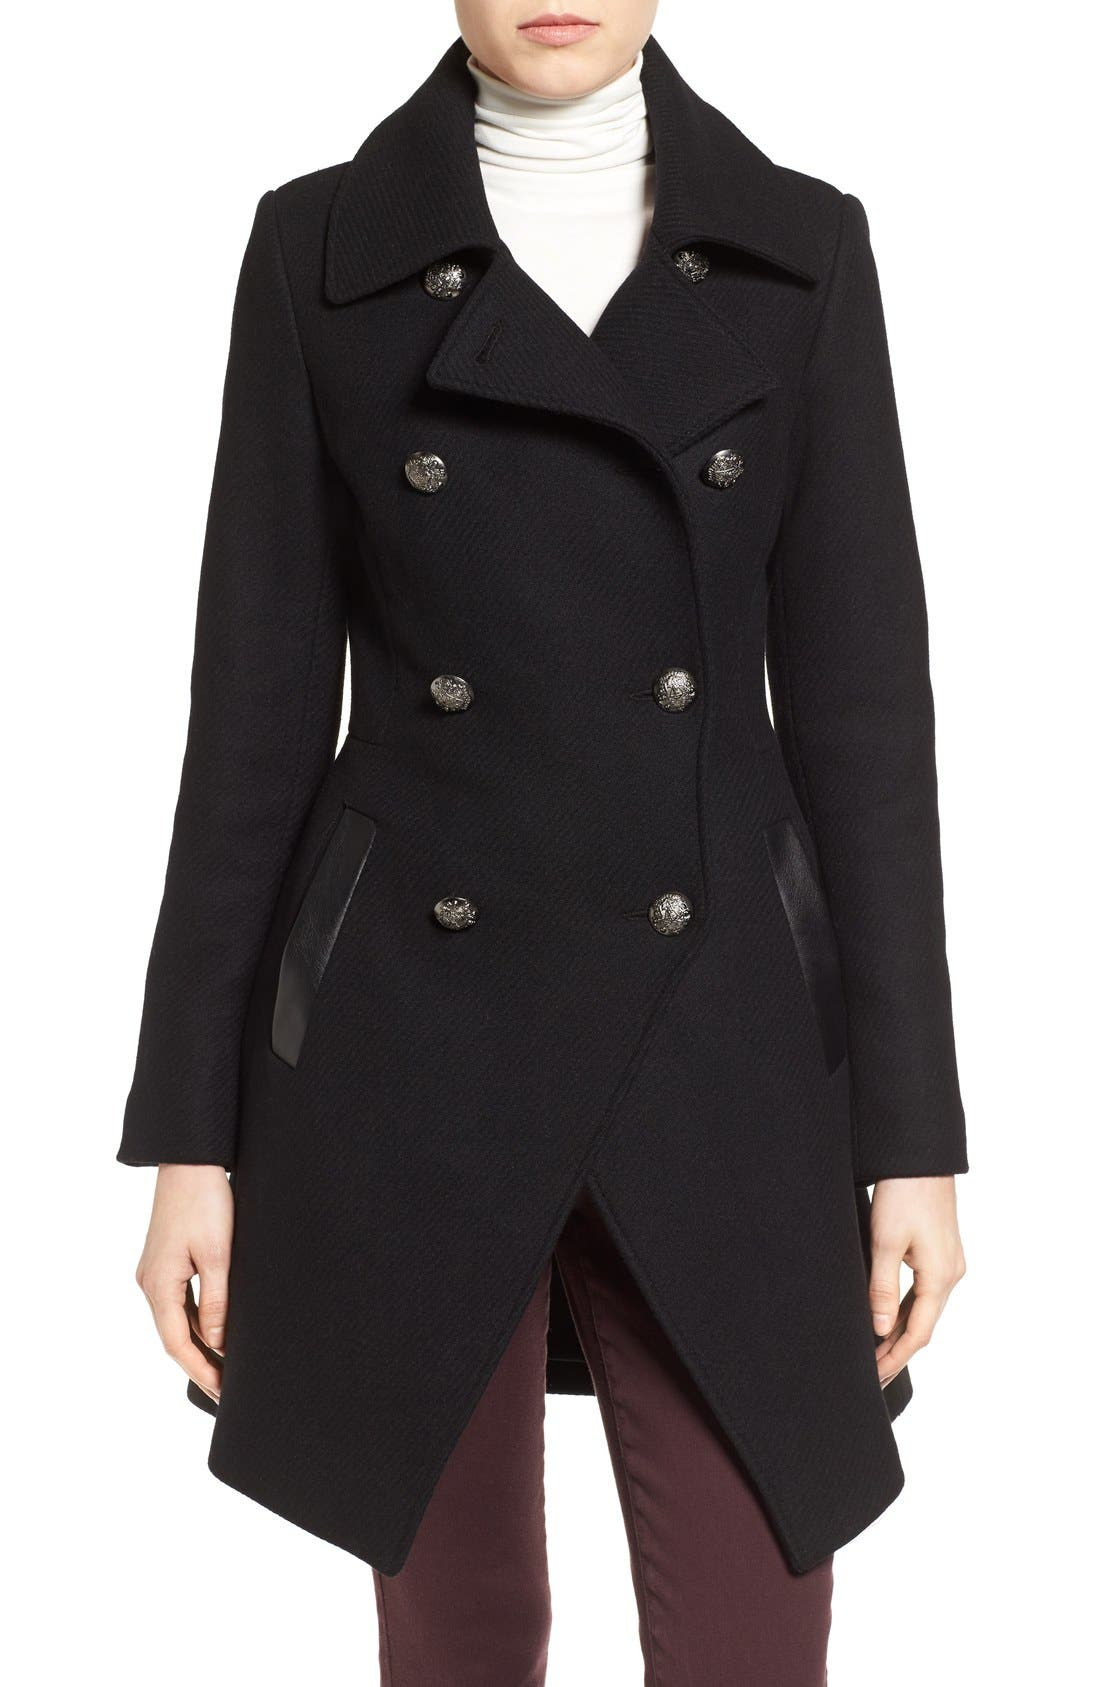 Main Image - Trina Turk Wool Blend Military Coat (Regular & Petite)